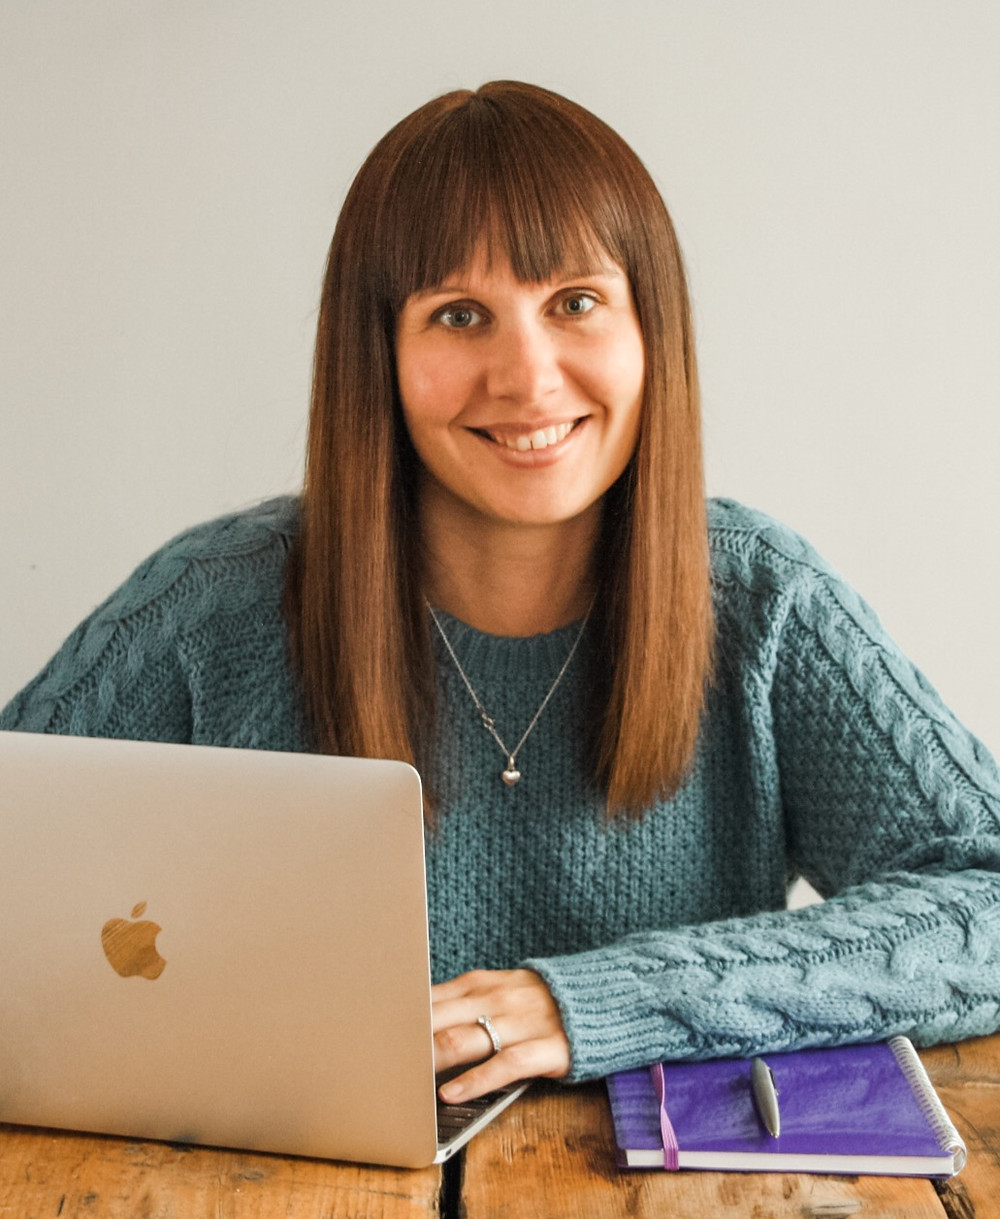 The Arts VA's Jenny sitting at a desk with a laptop